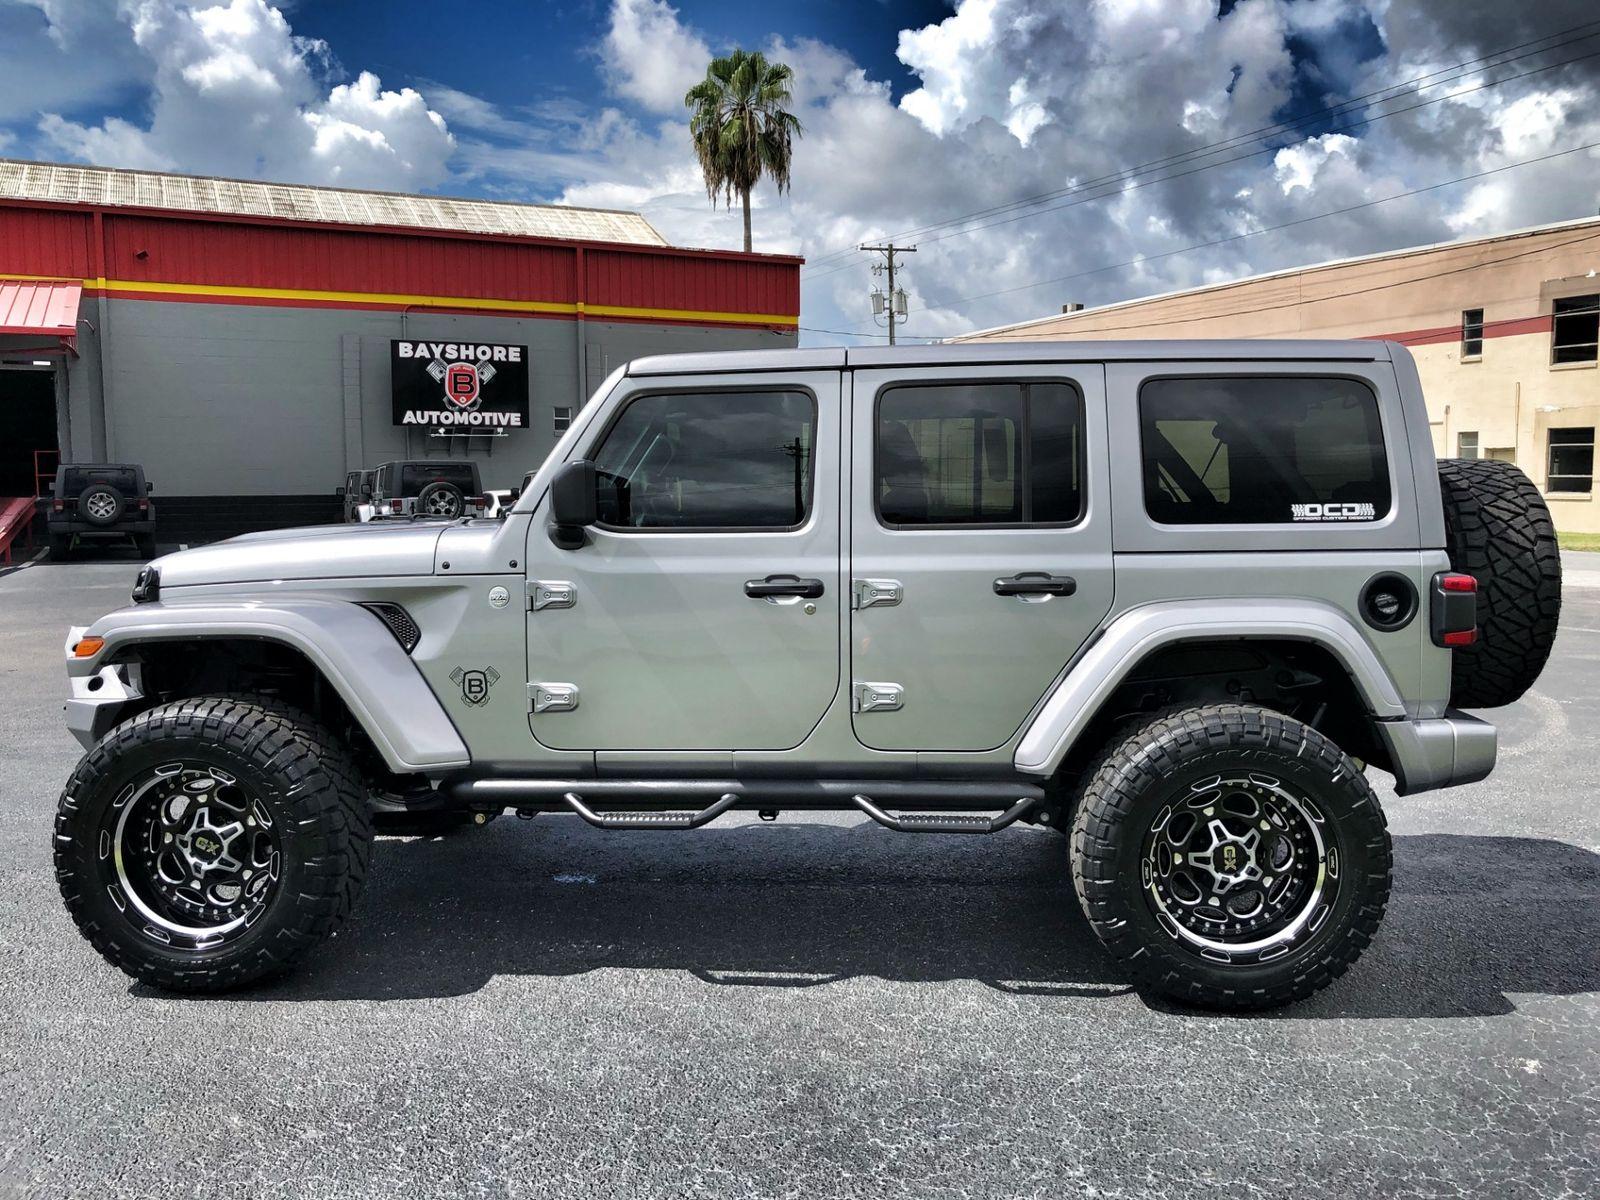 2018 jeep all new wrangler unlimited jl custom lifted leather hardtop evo 35s ocd florida. Black Bedroom Furniture Sets. Home Design Ideas